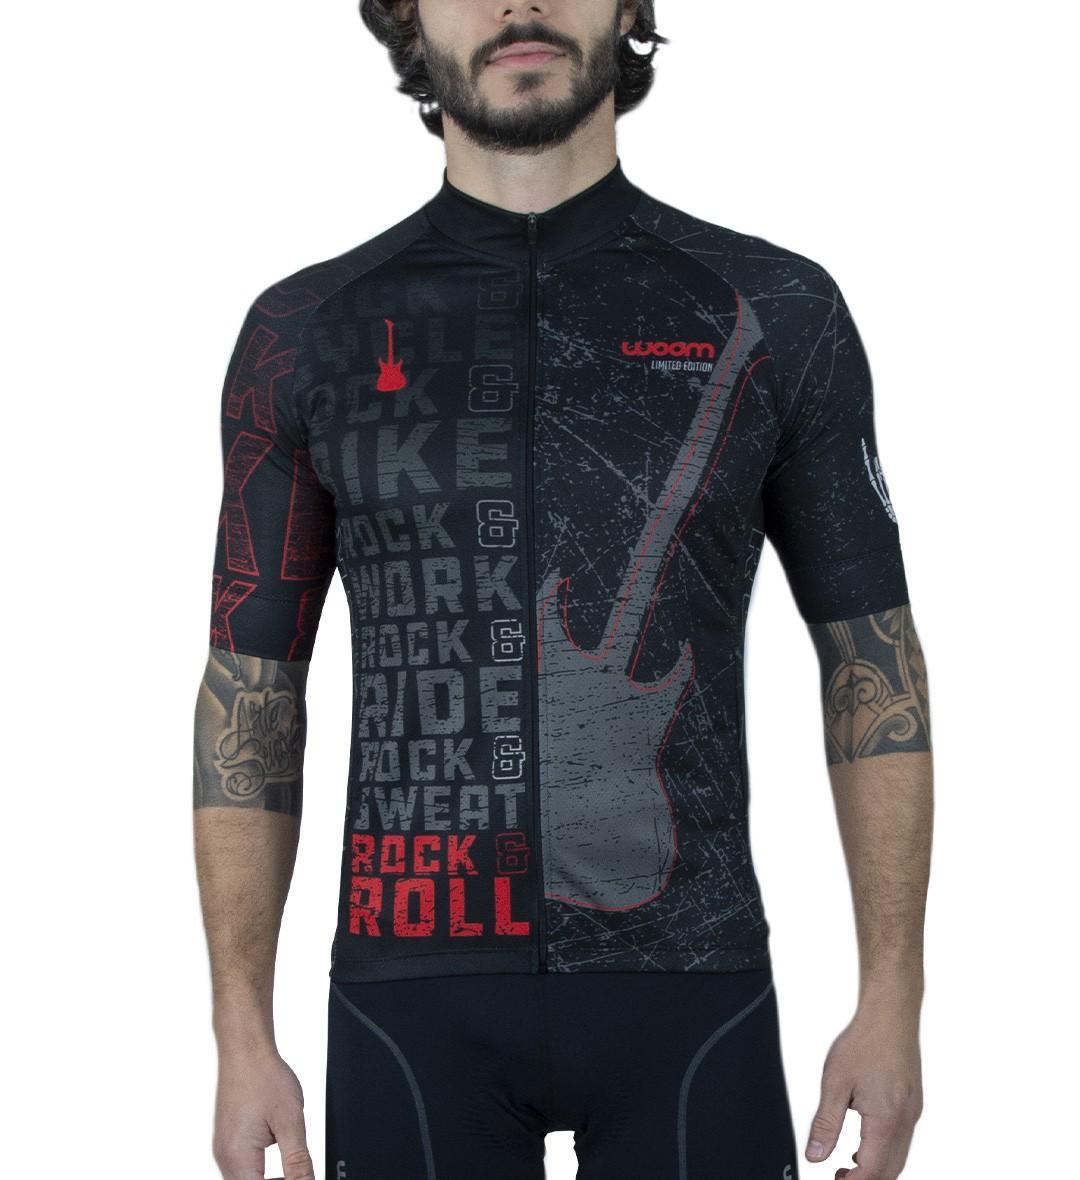 Camisa Ciclismo Rock n Roll Masc - Preto - Ed. Ltda